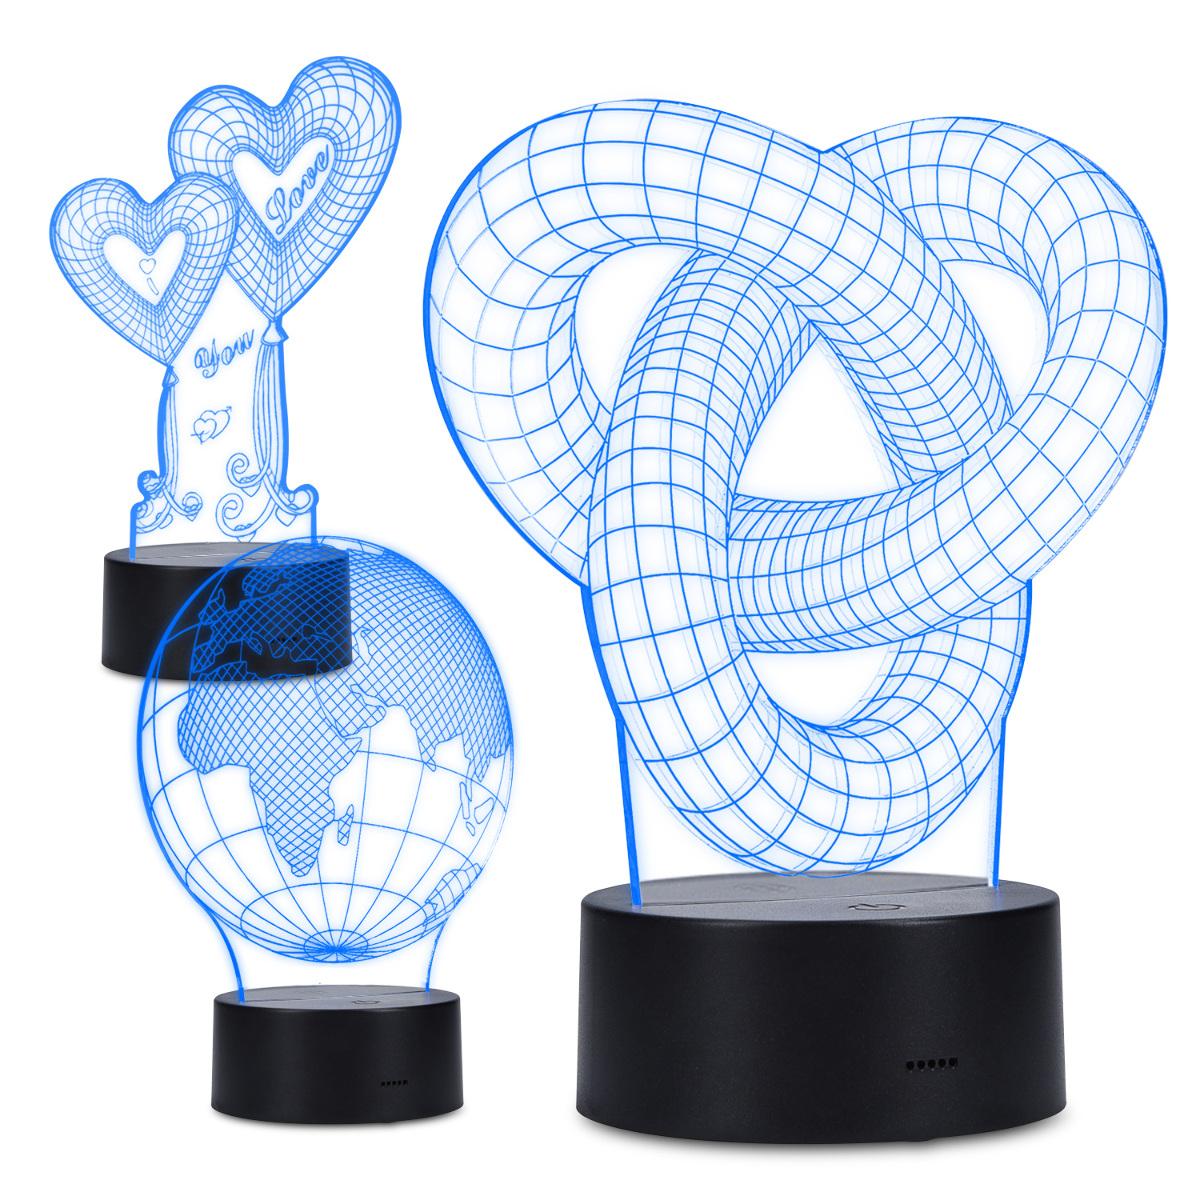 3d led dekolampe illusion lampe nachtlicht 3 designs optische t uschung ebay. Black Bedroom Furniture Sets. Home Design Ideas